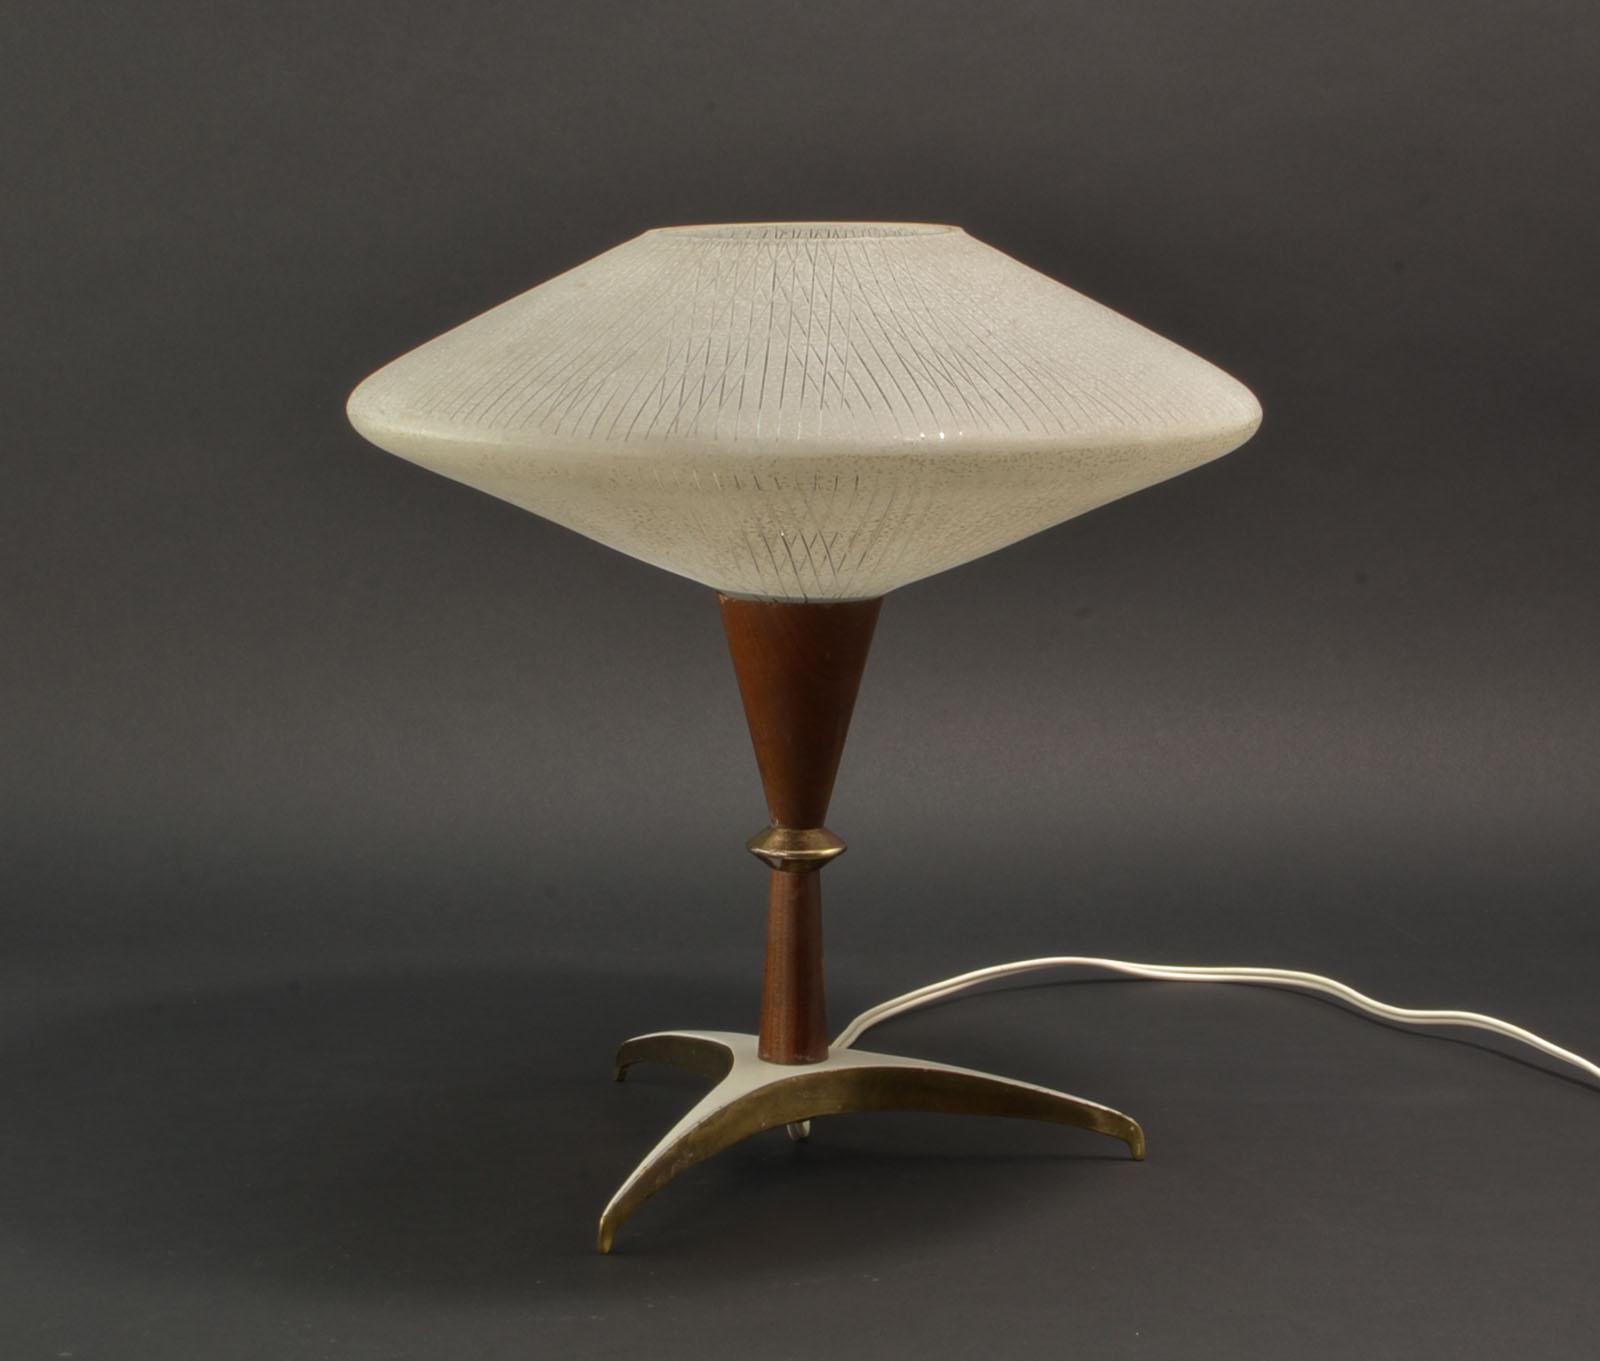 Mid Century Decorative Atomic Tripod Teak Brass Glass Table Lamp, 1950s